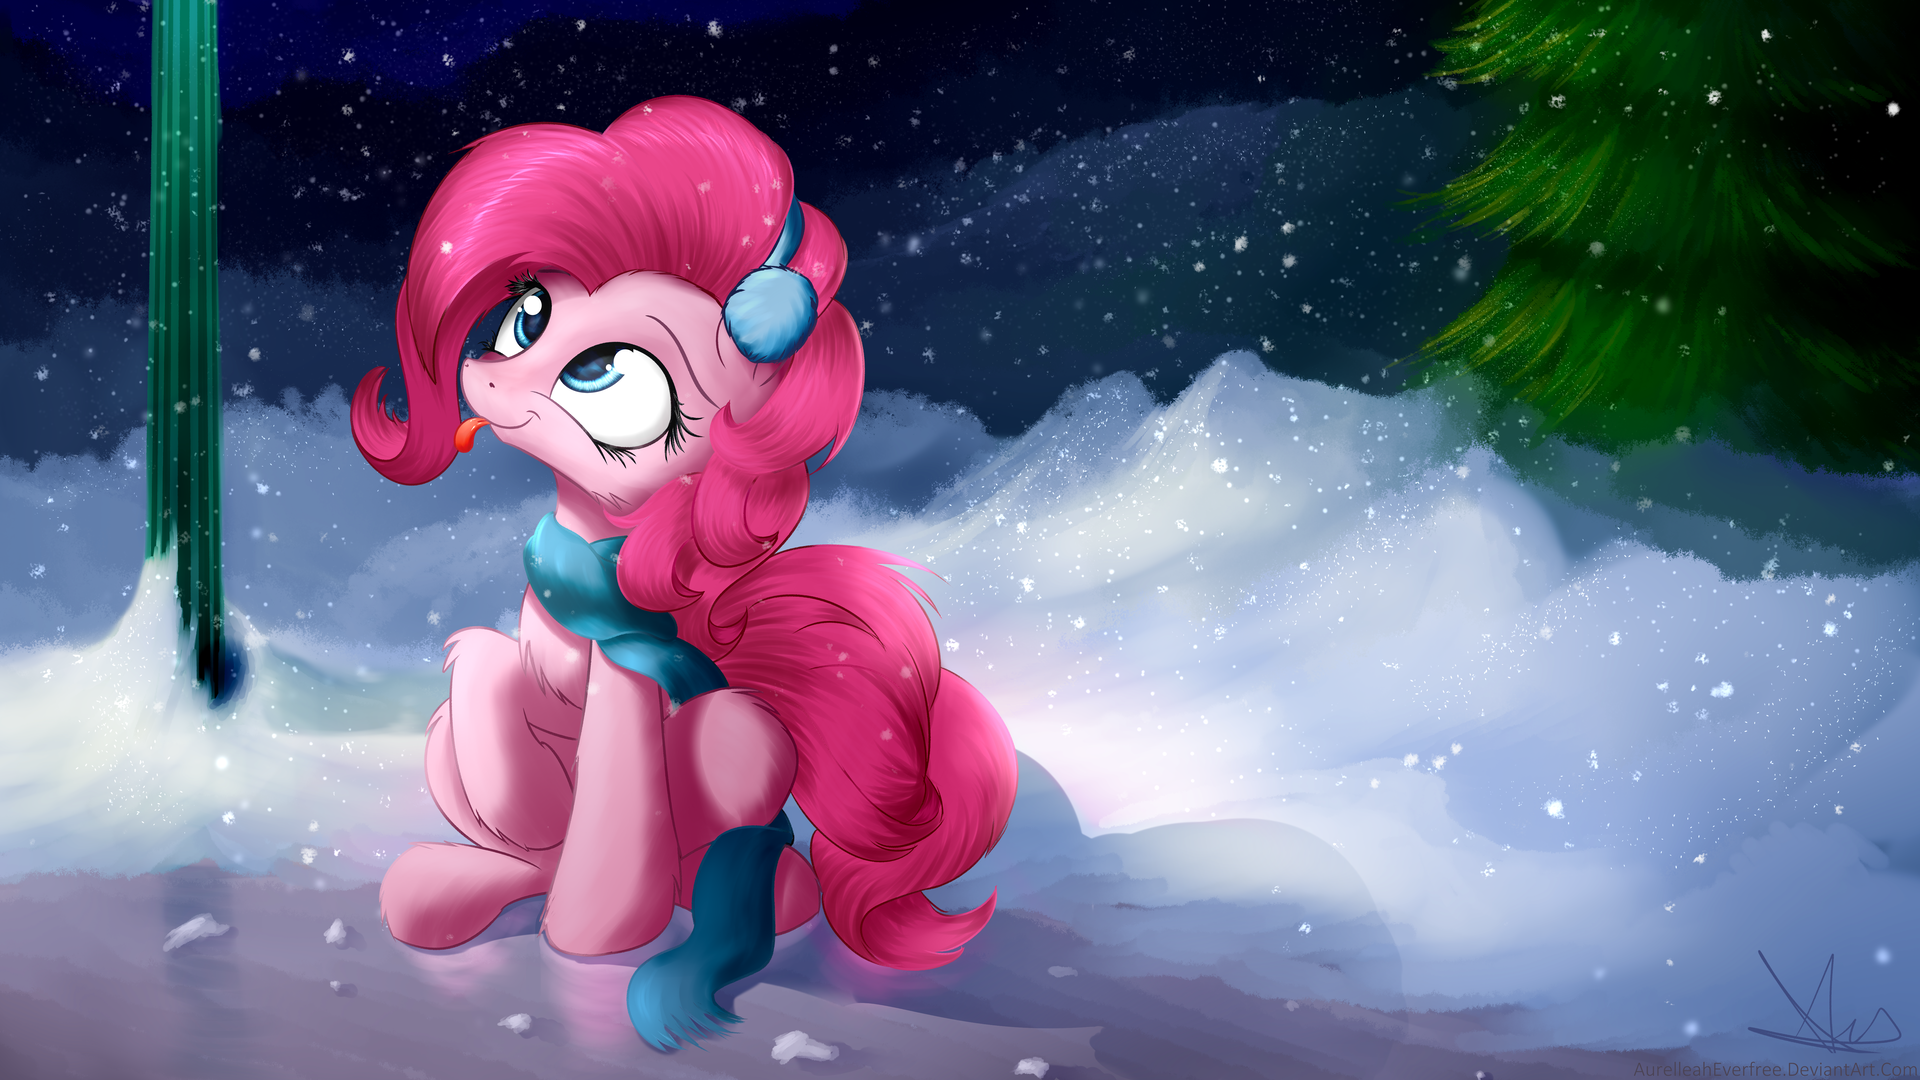 Pinkie Pie Blep: Expert Snowflake Catcher [Comm] by AurelleahEverfree